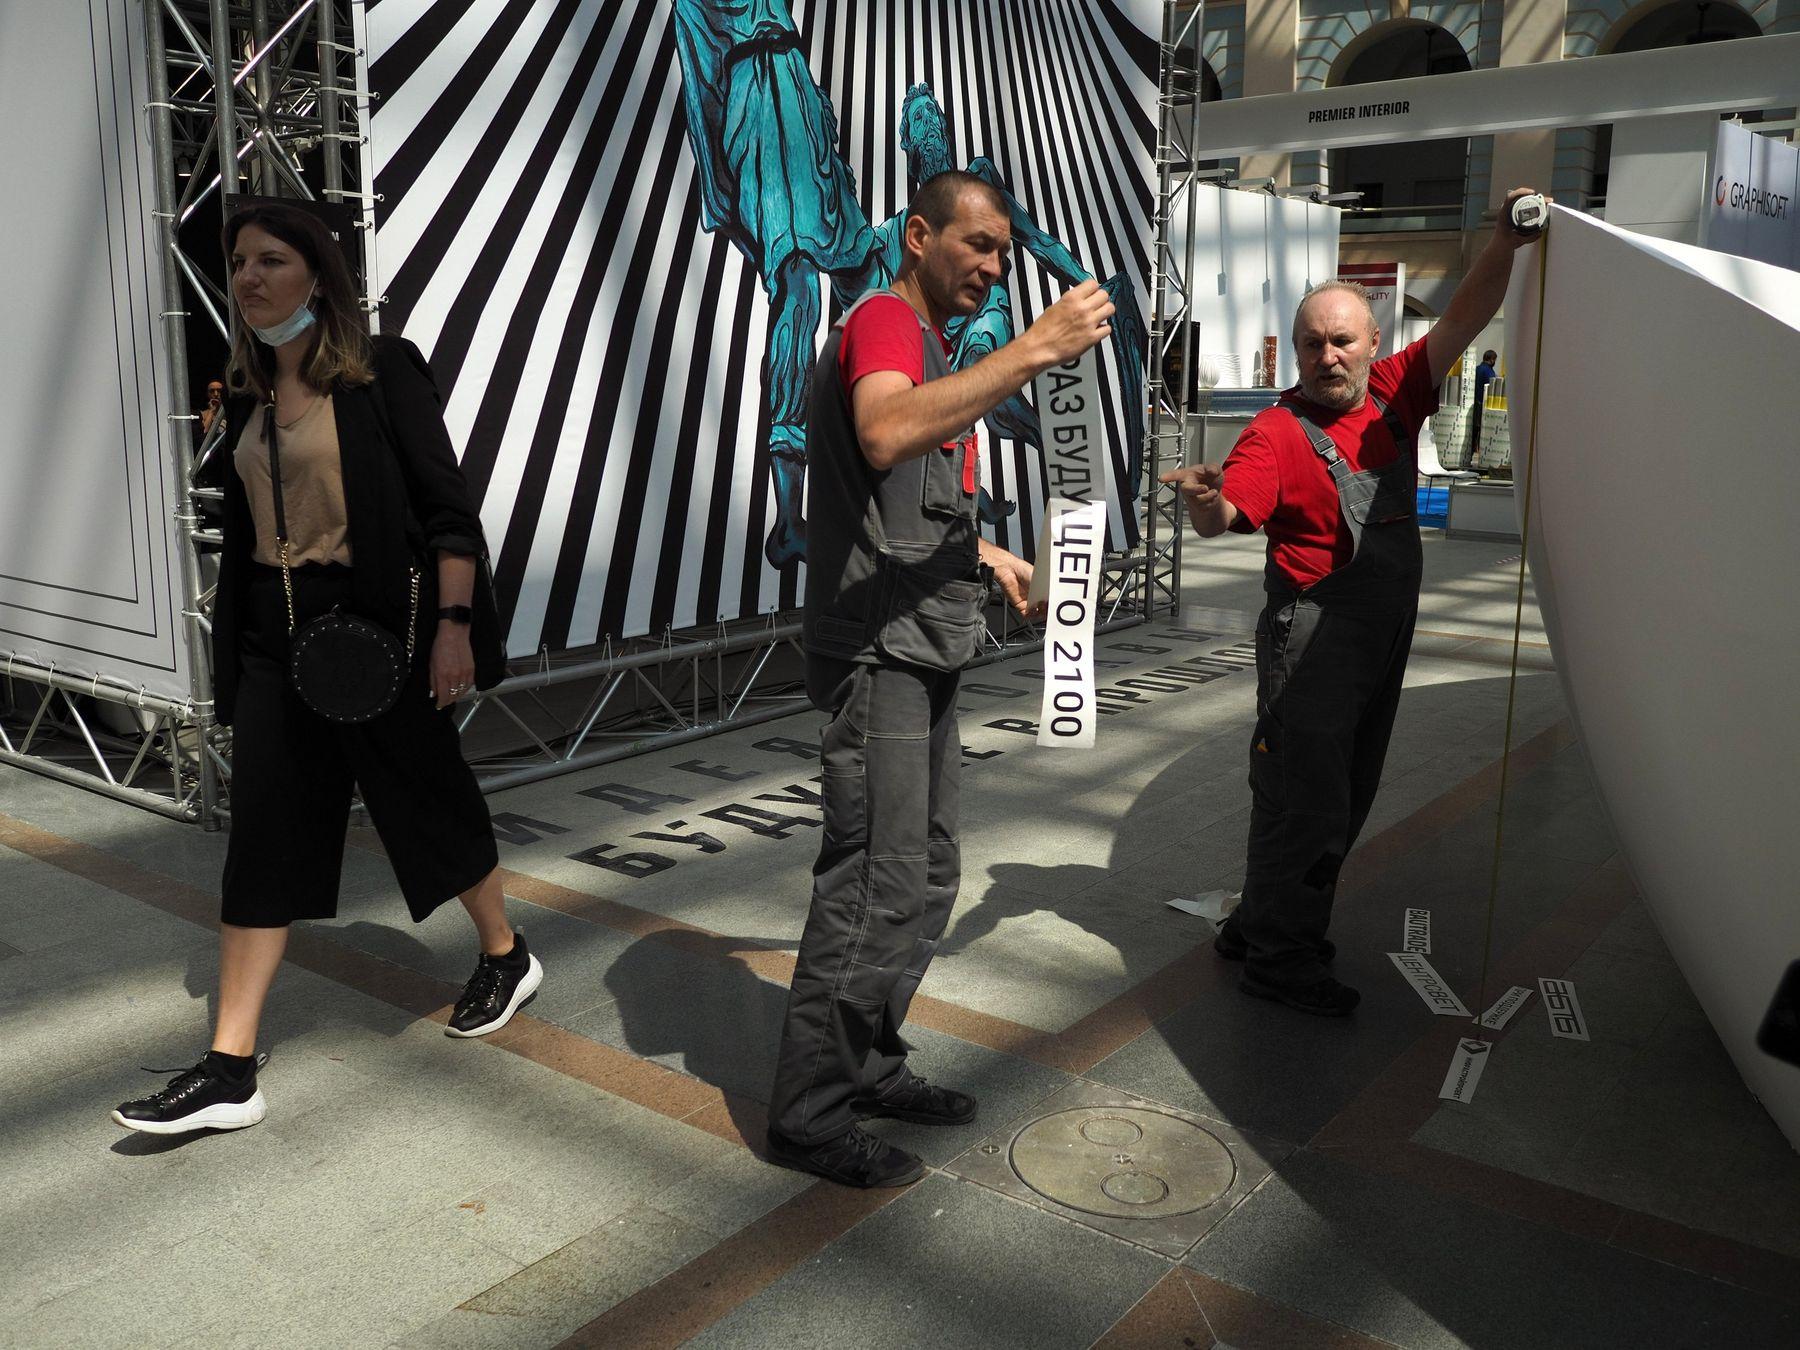 Арх Москва. Люди на выставке арх москва